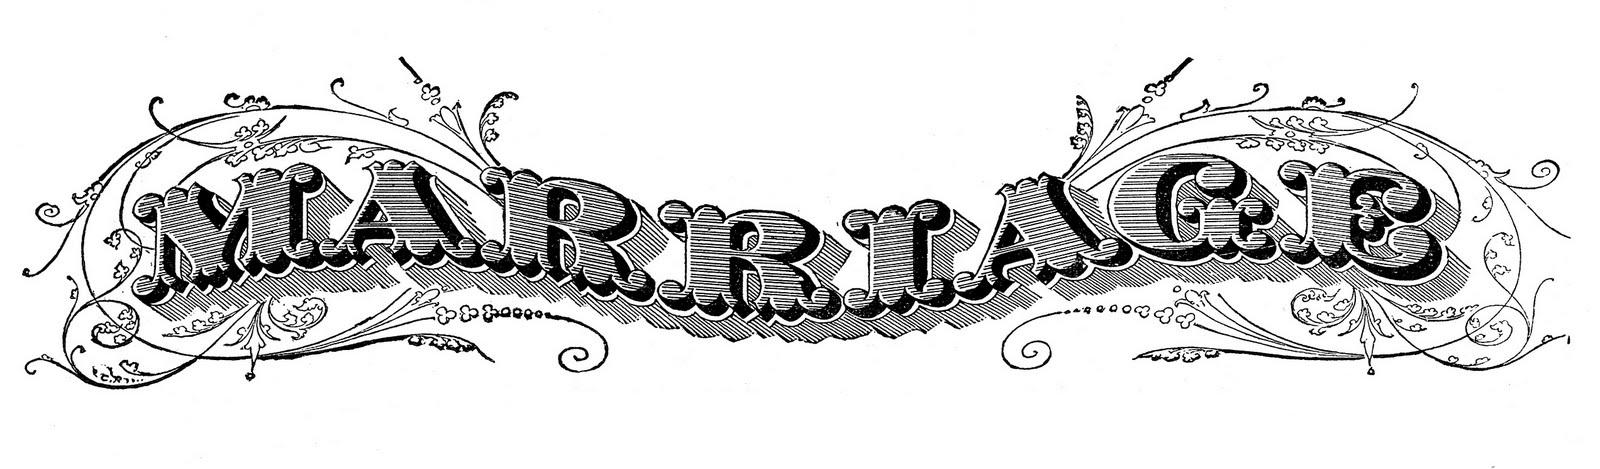 Typography clipart vintage bridal Clip Wedding  Art The